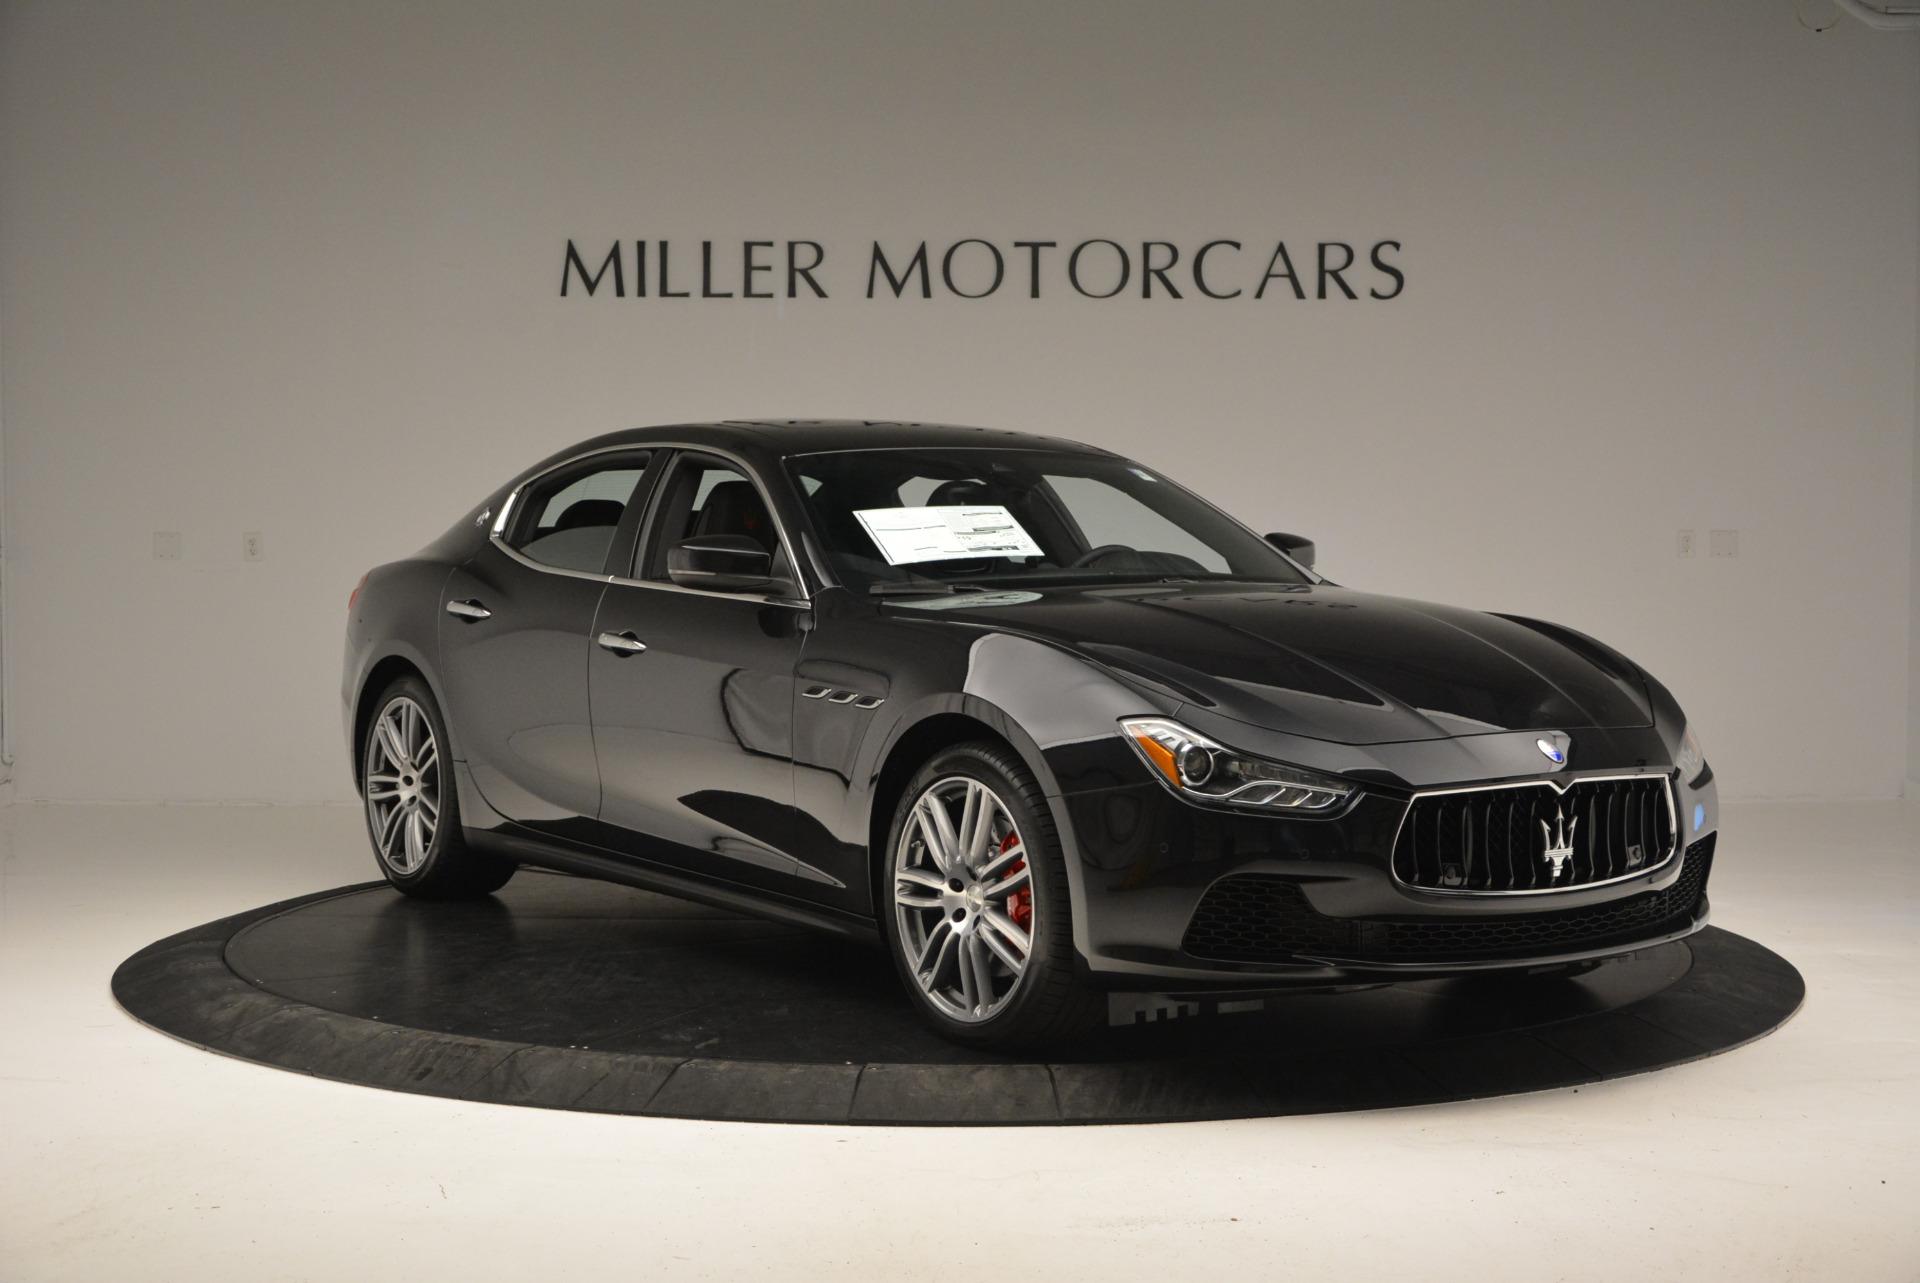 New 2017 Maserati Ghibli S Q4 For Sale In Westport, CT 605_p11